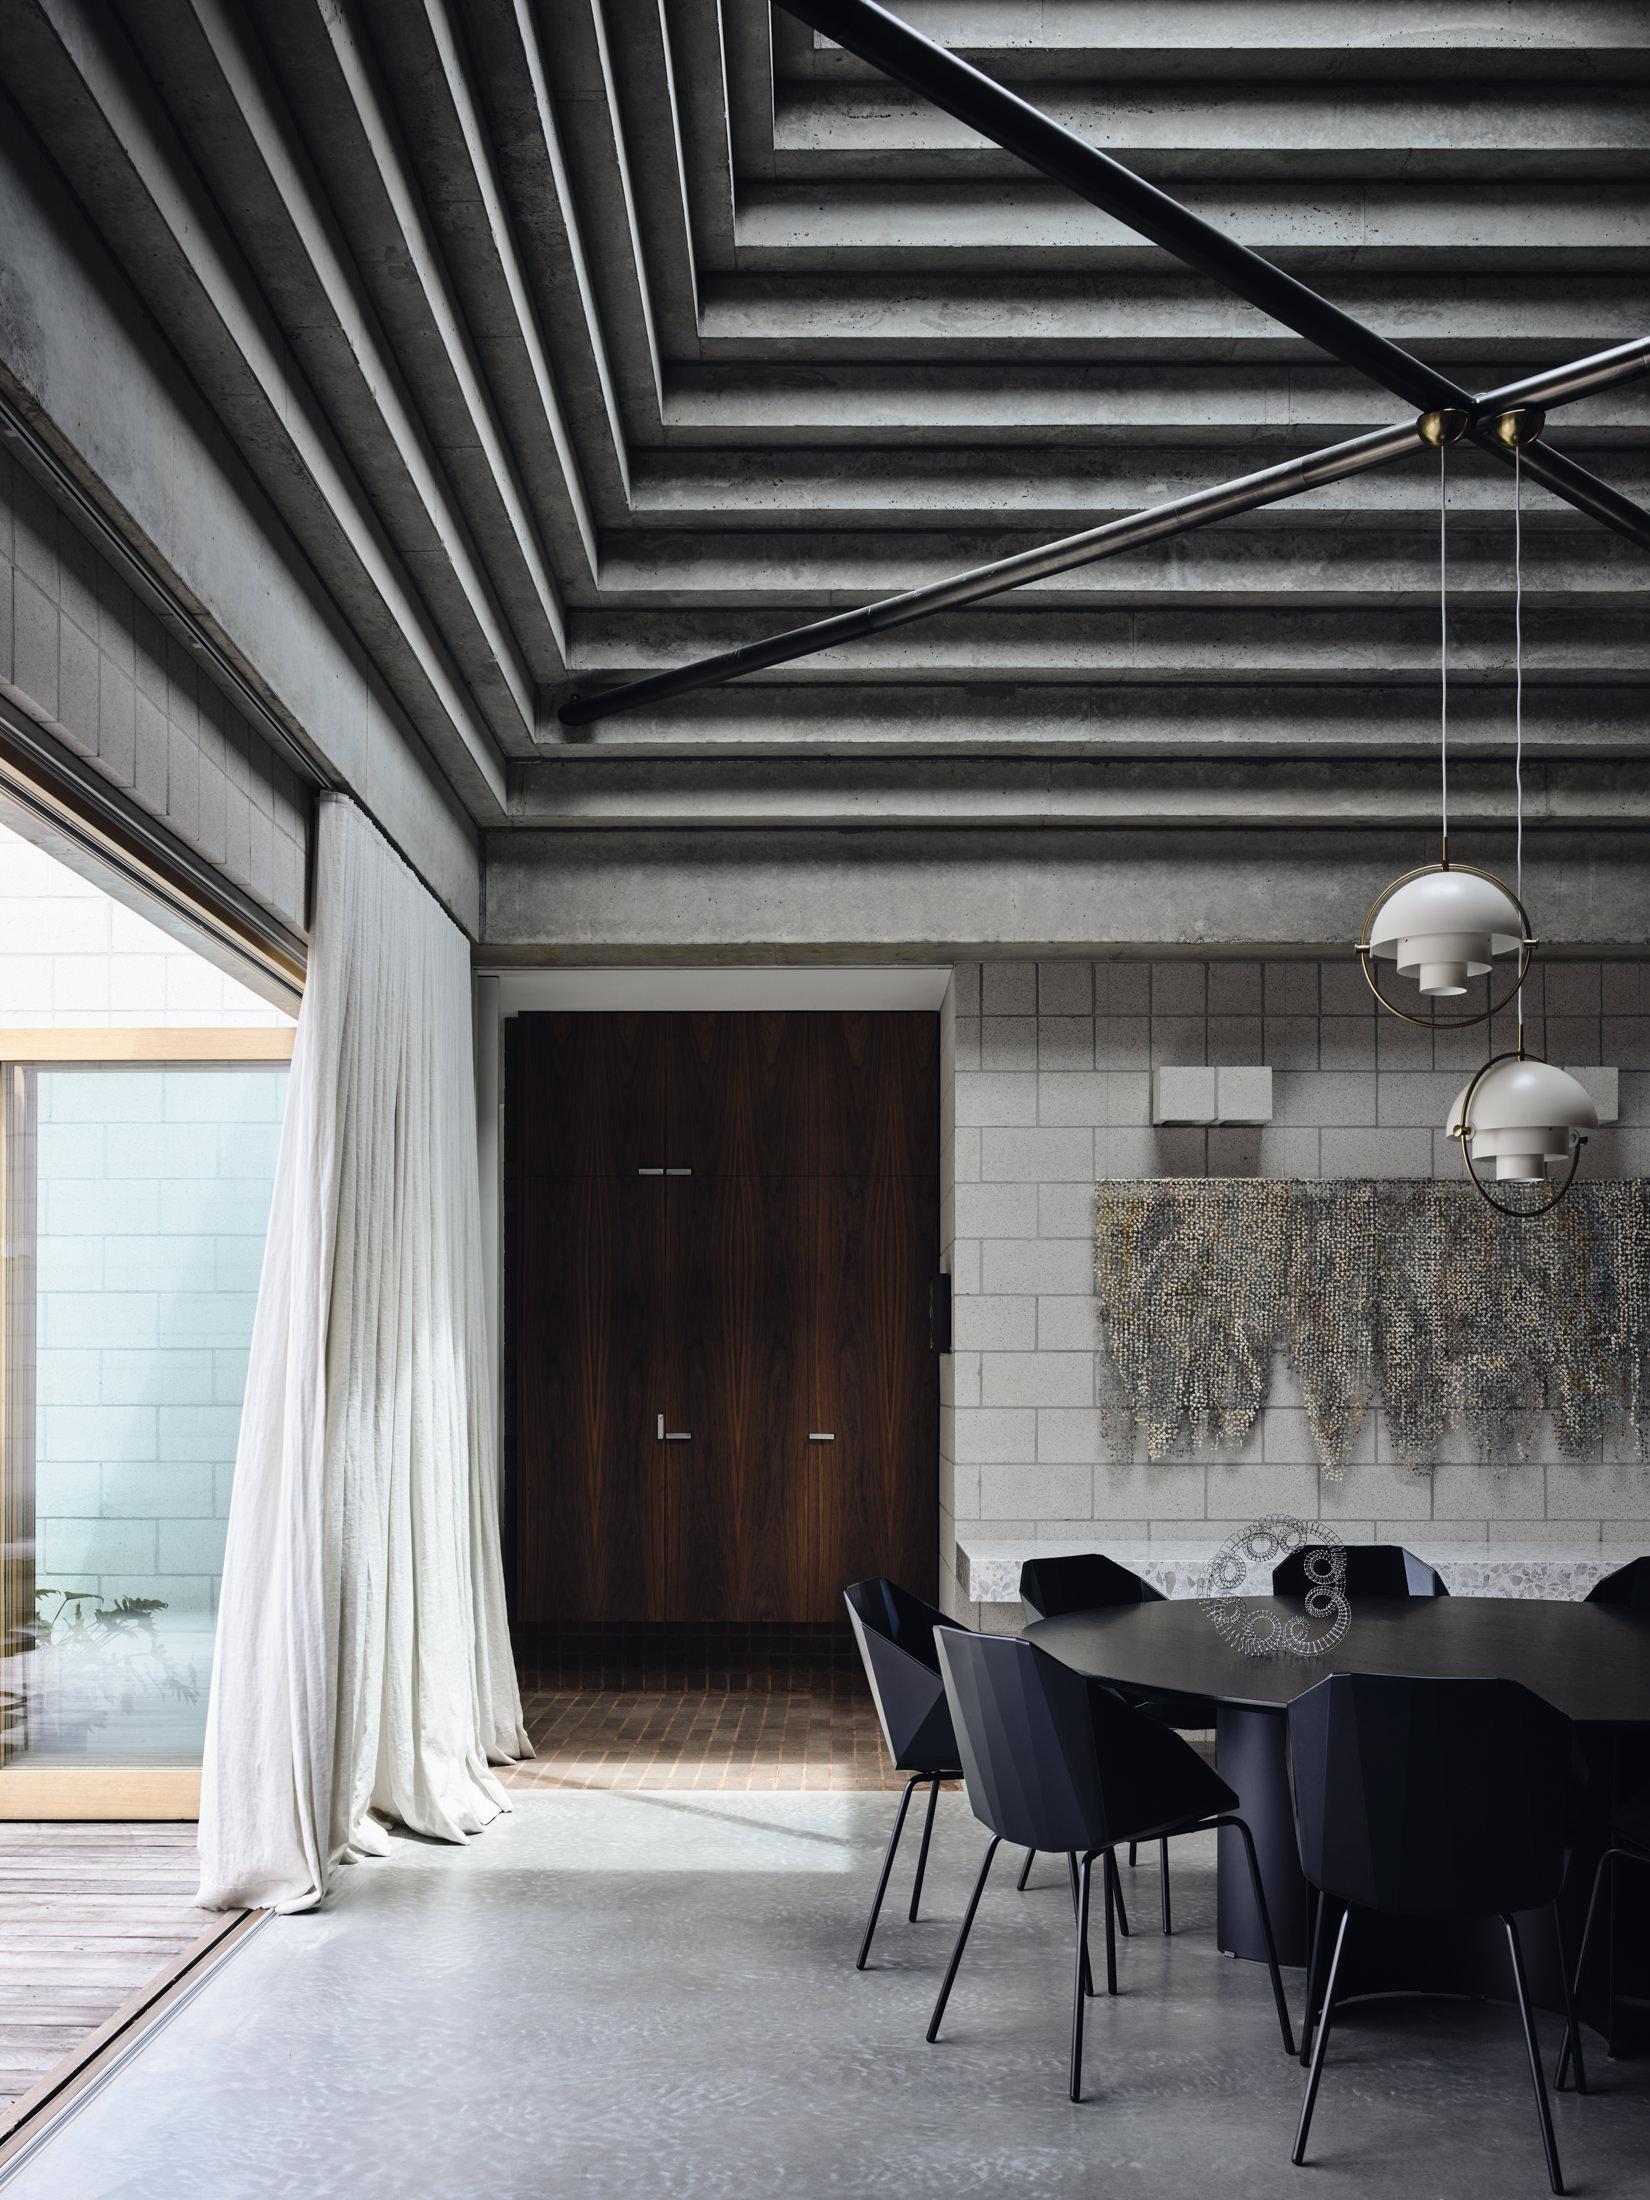 Architects Eat Bellows Beach House Flinders Masonry Architecture Photo Derek Swalwell Yellowtrace 22